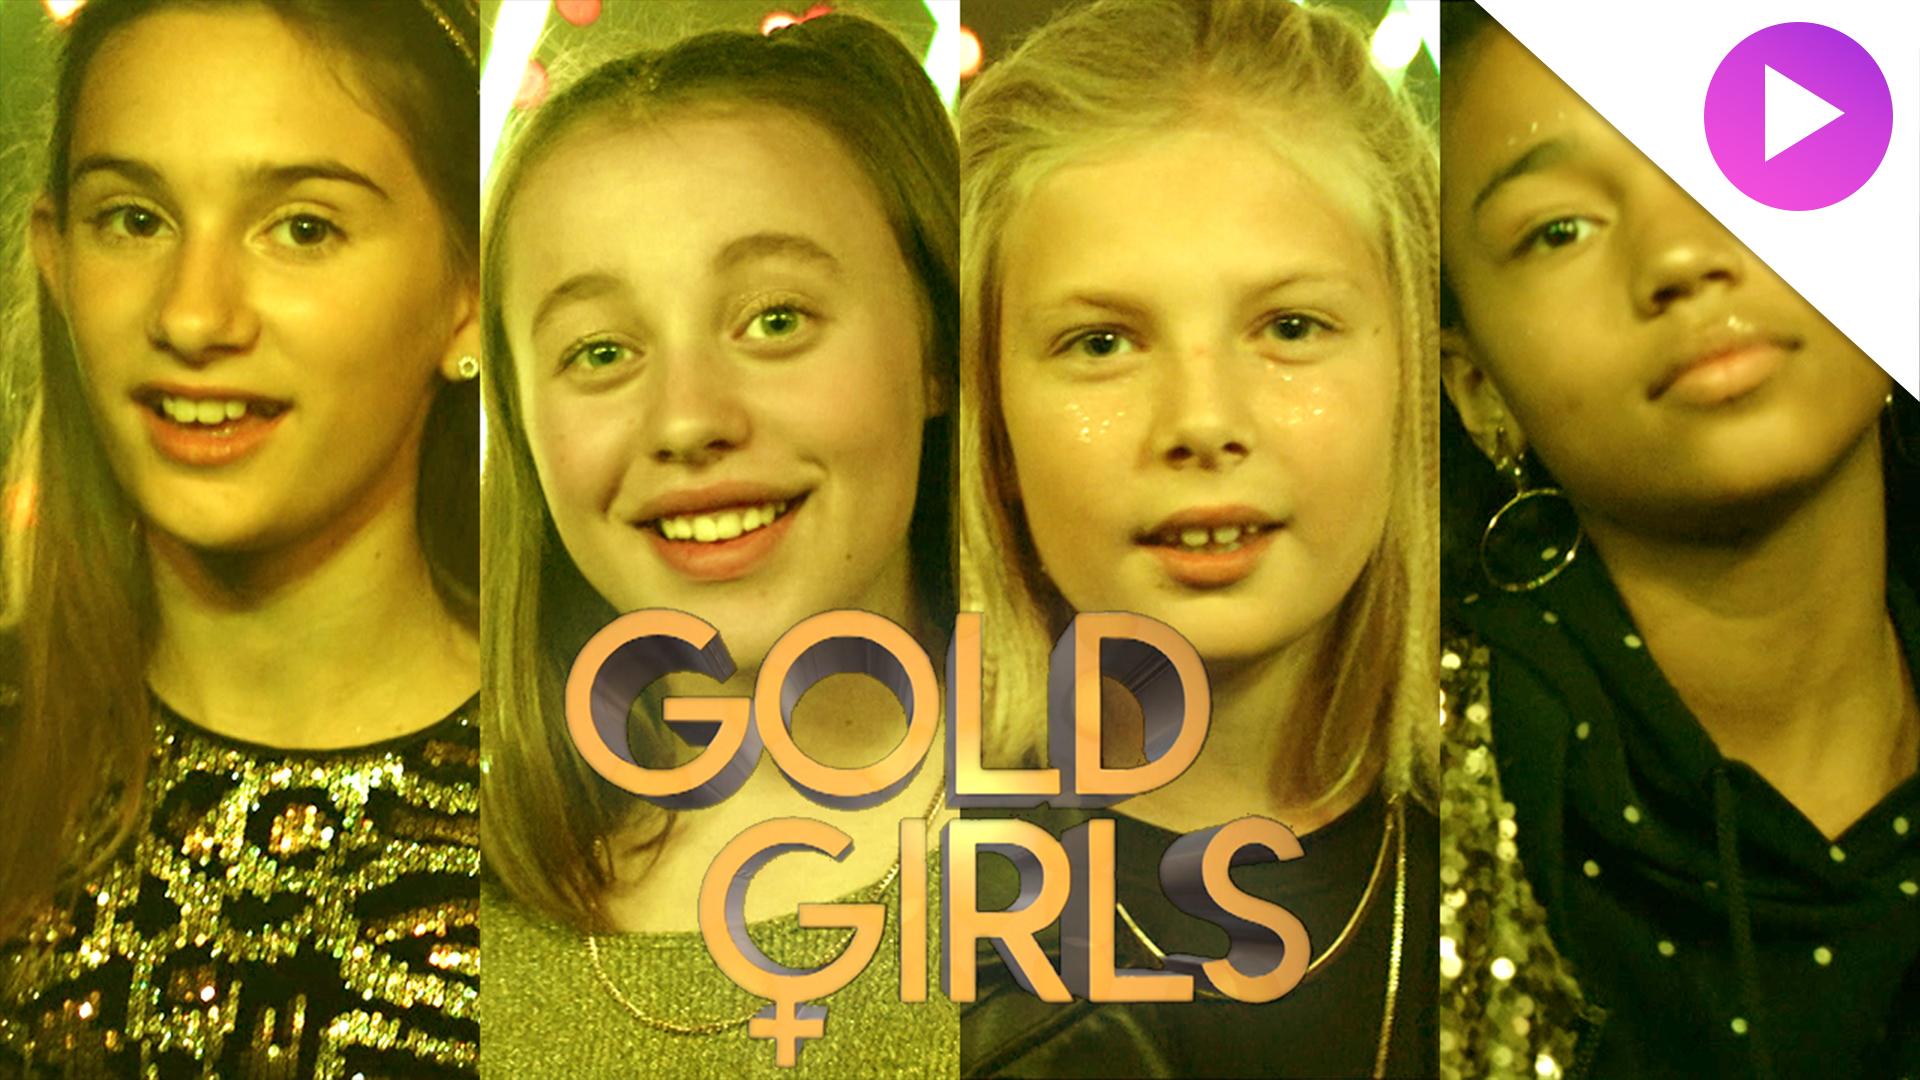 goldgirls_-_skybrud_musikvideo_drupal.jpg